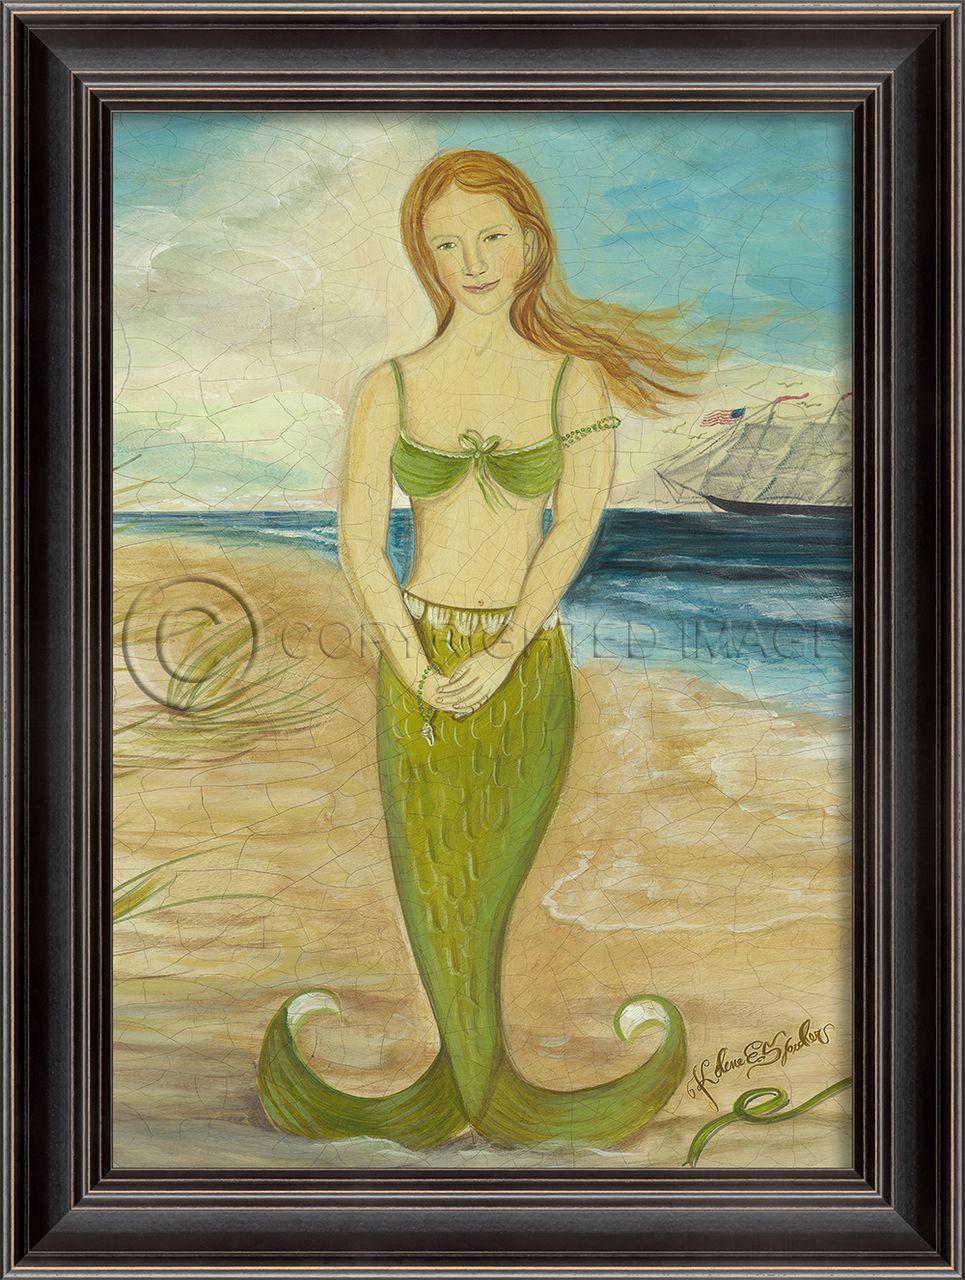 Red-Headed Mermaid in Green Framed Wall Art - Small | Mermaid, Black ...